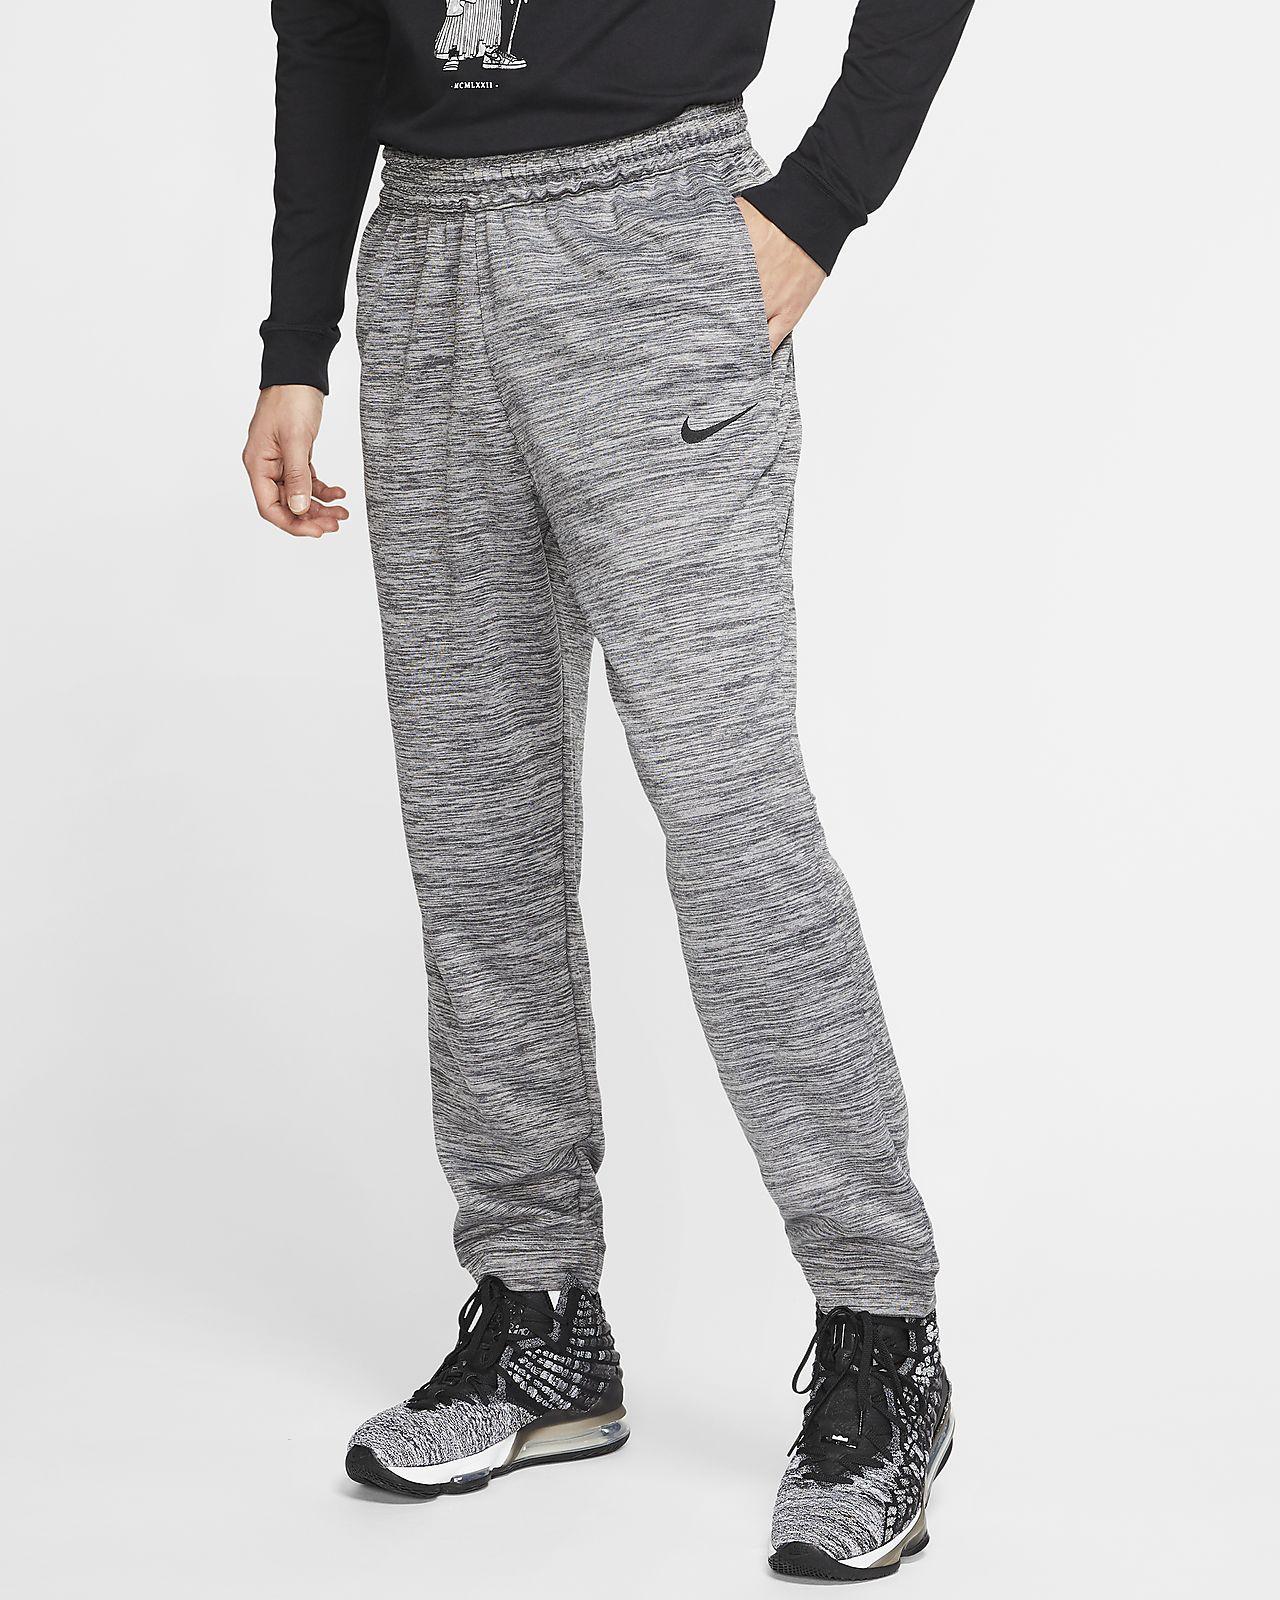 Pantalones de básquetbol para hombre Nike Spotlight